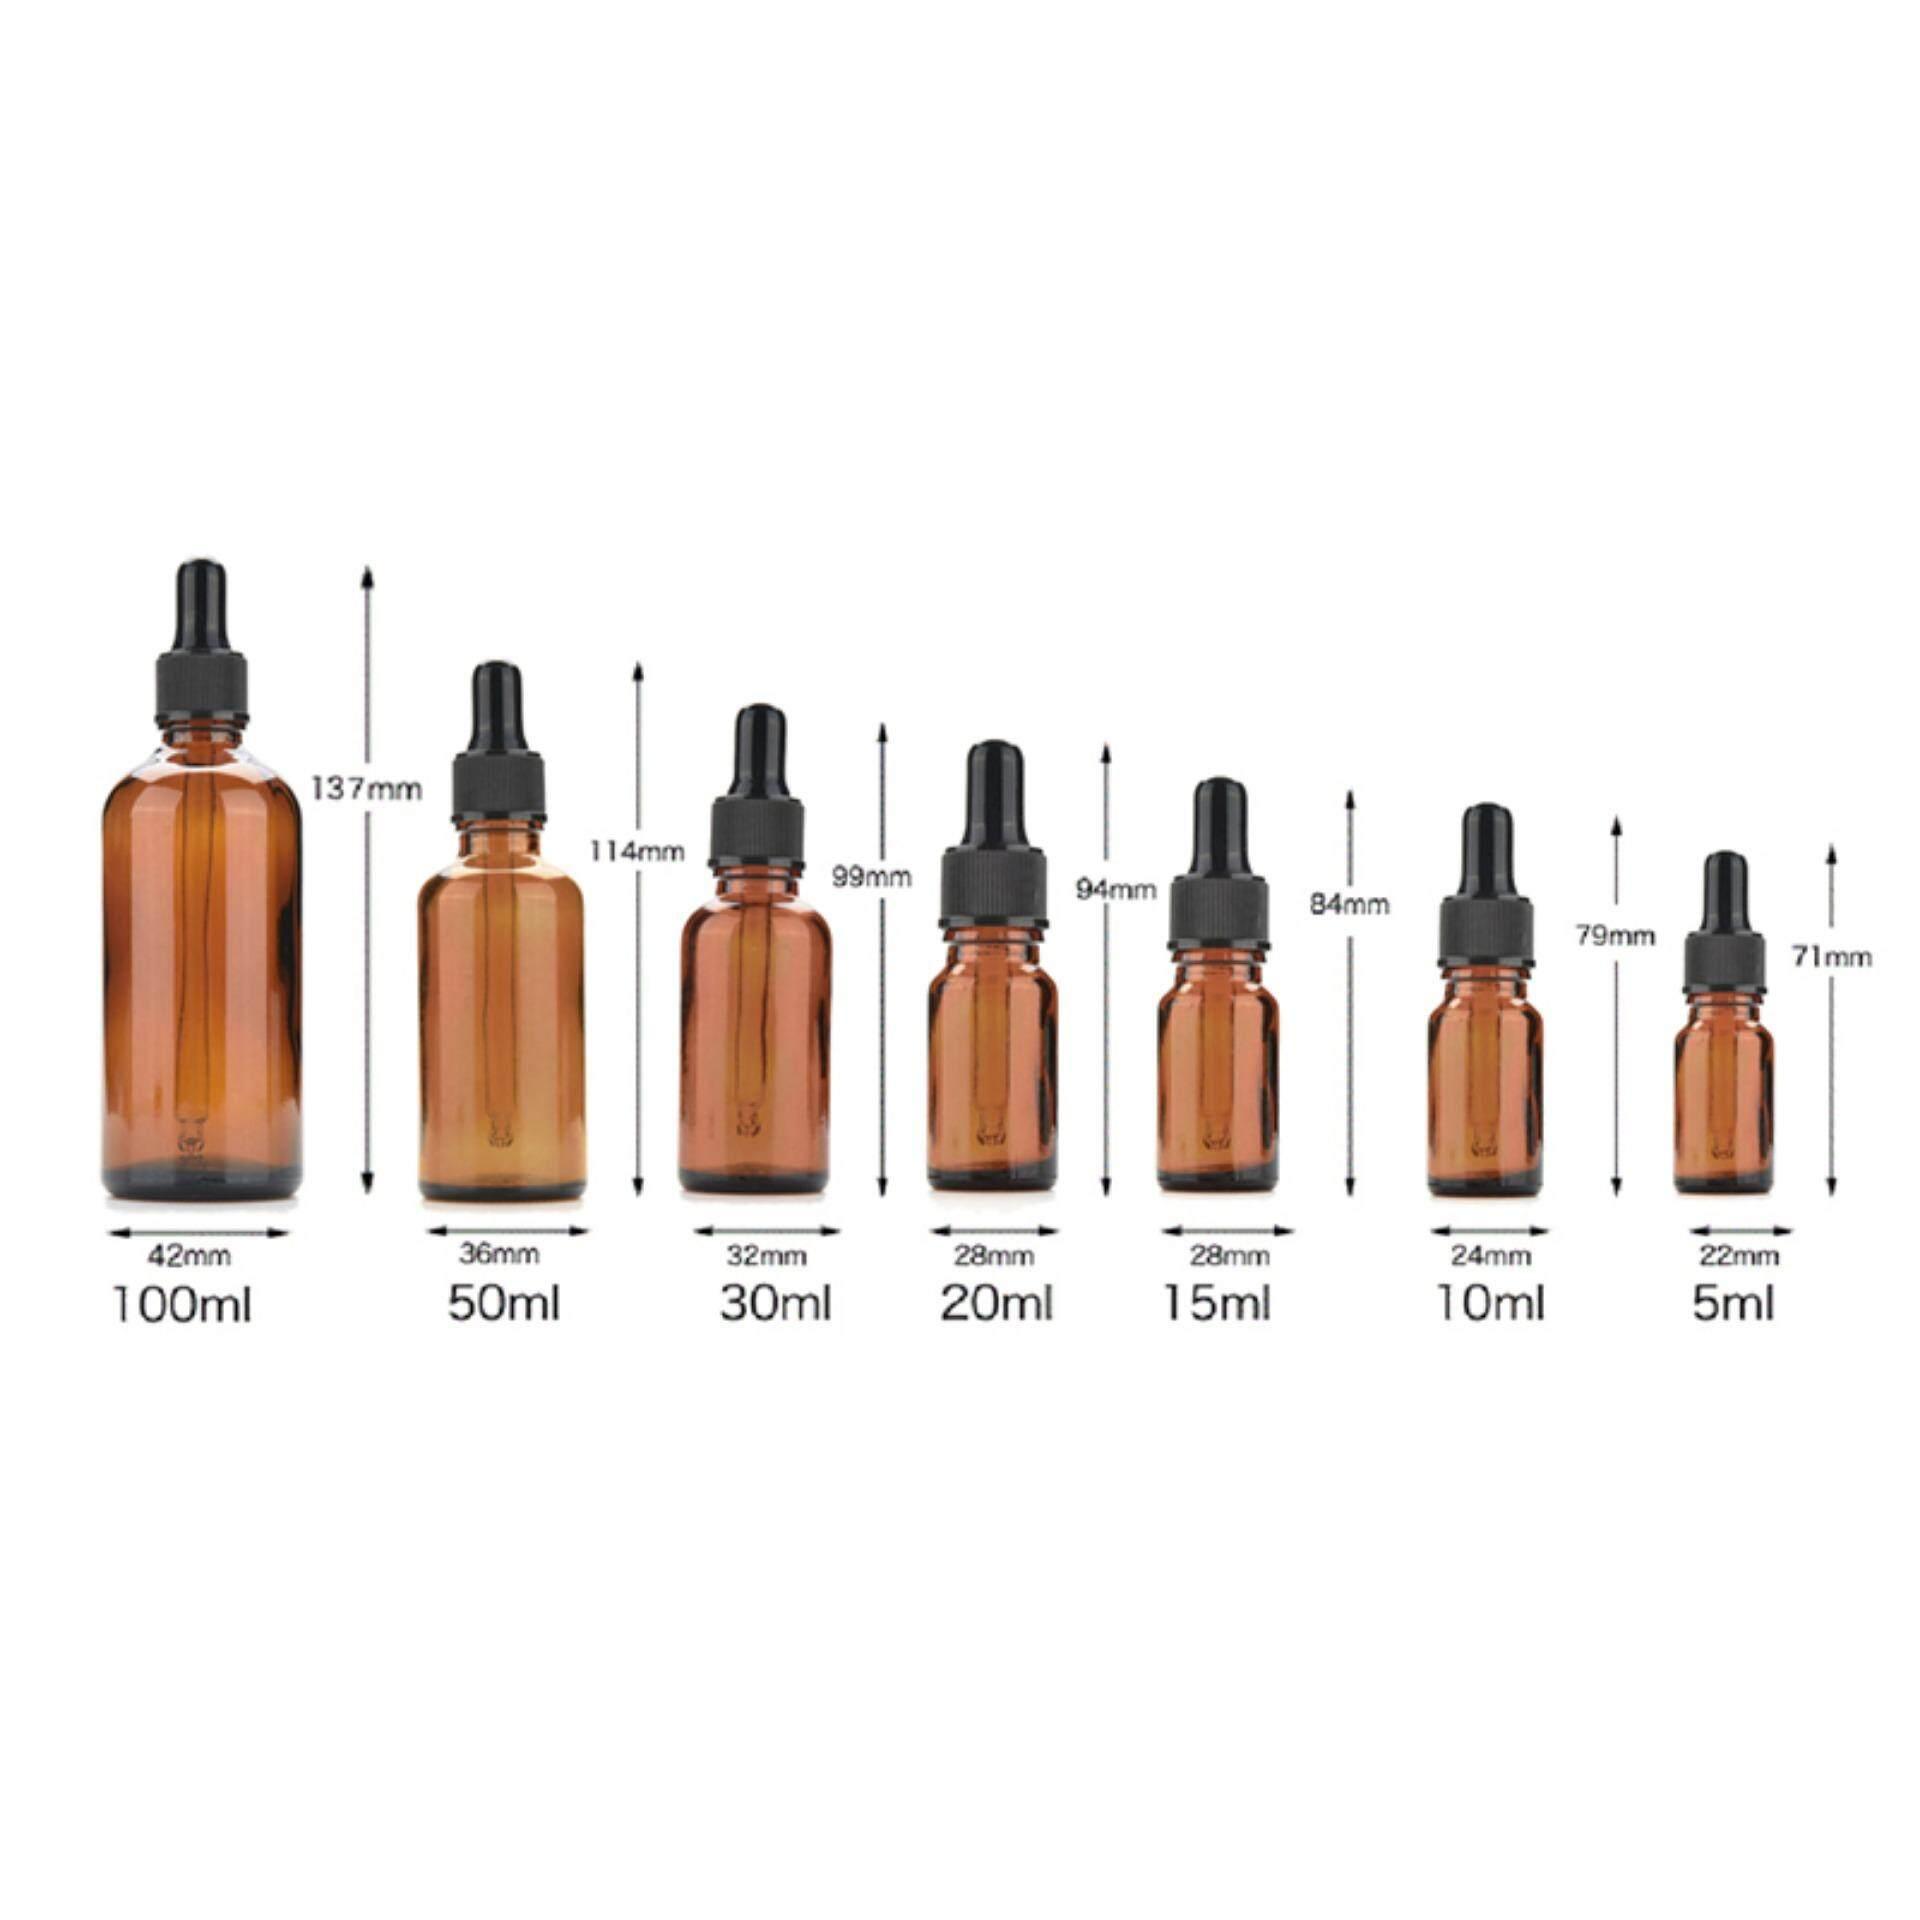 Fitur New 5ml 100ml Amber Glass Liquid Reagent Pipette Bottle Eye Botol Pipet Kaca 30 Ml 30ml Dropper Aromatherapy 4